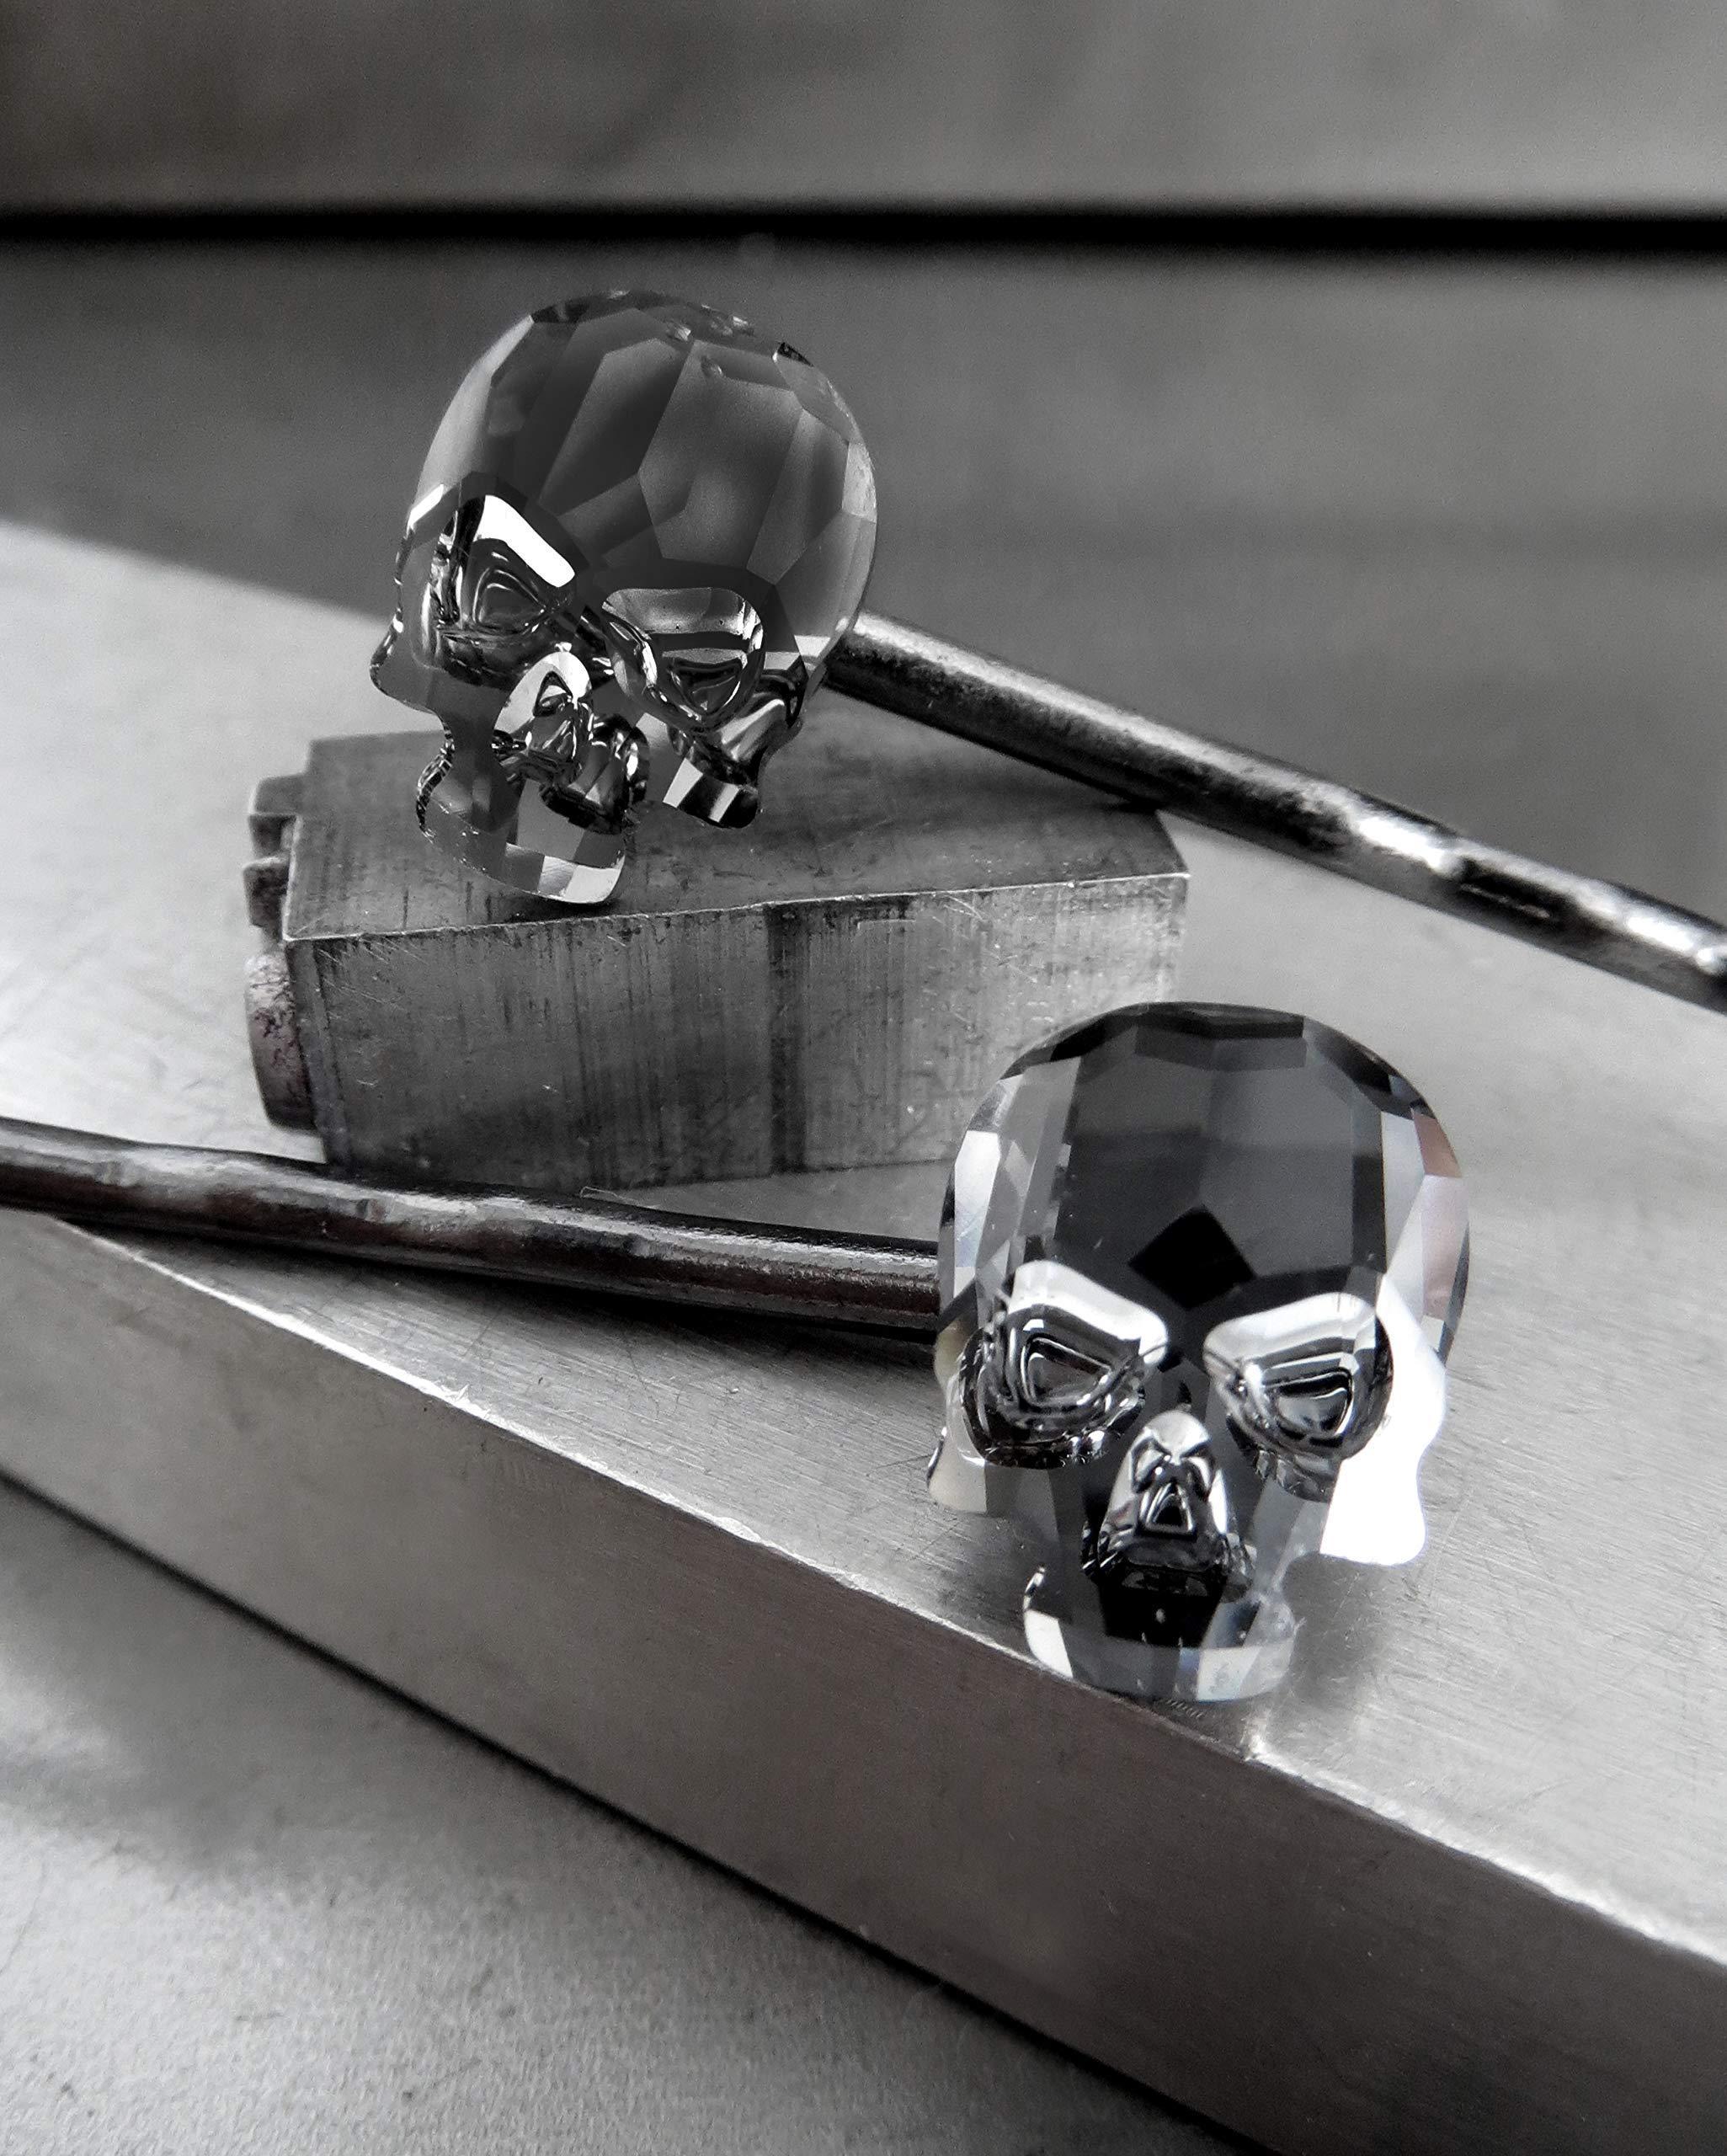 Swarovski Crystal Skull Hair Pins in Sparkling Black Midnight - Set of 2 - Gothic Halloween Jewelry